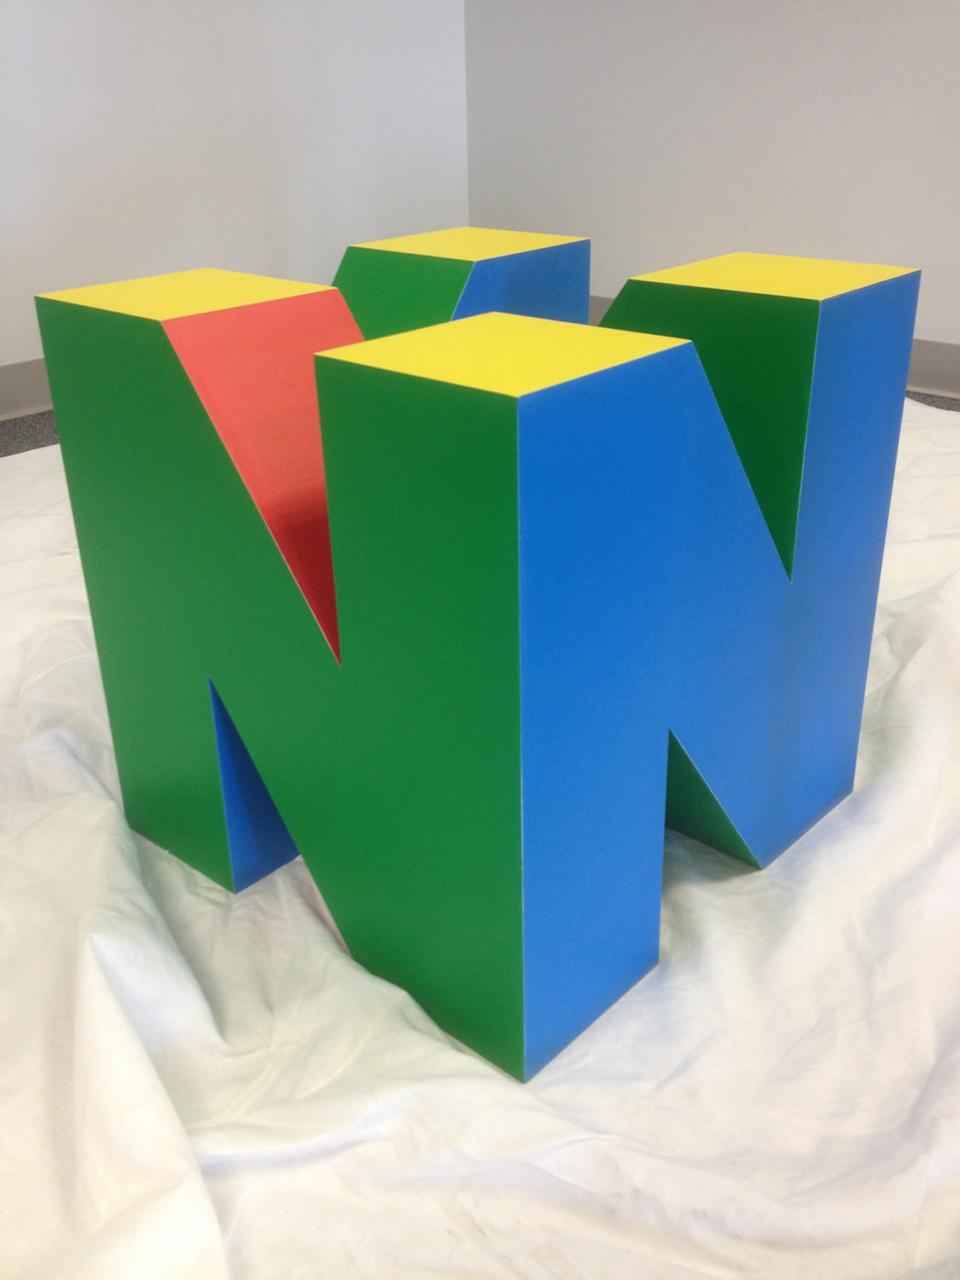 nintendo 64 coffee table base: insert glass top - technabob